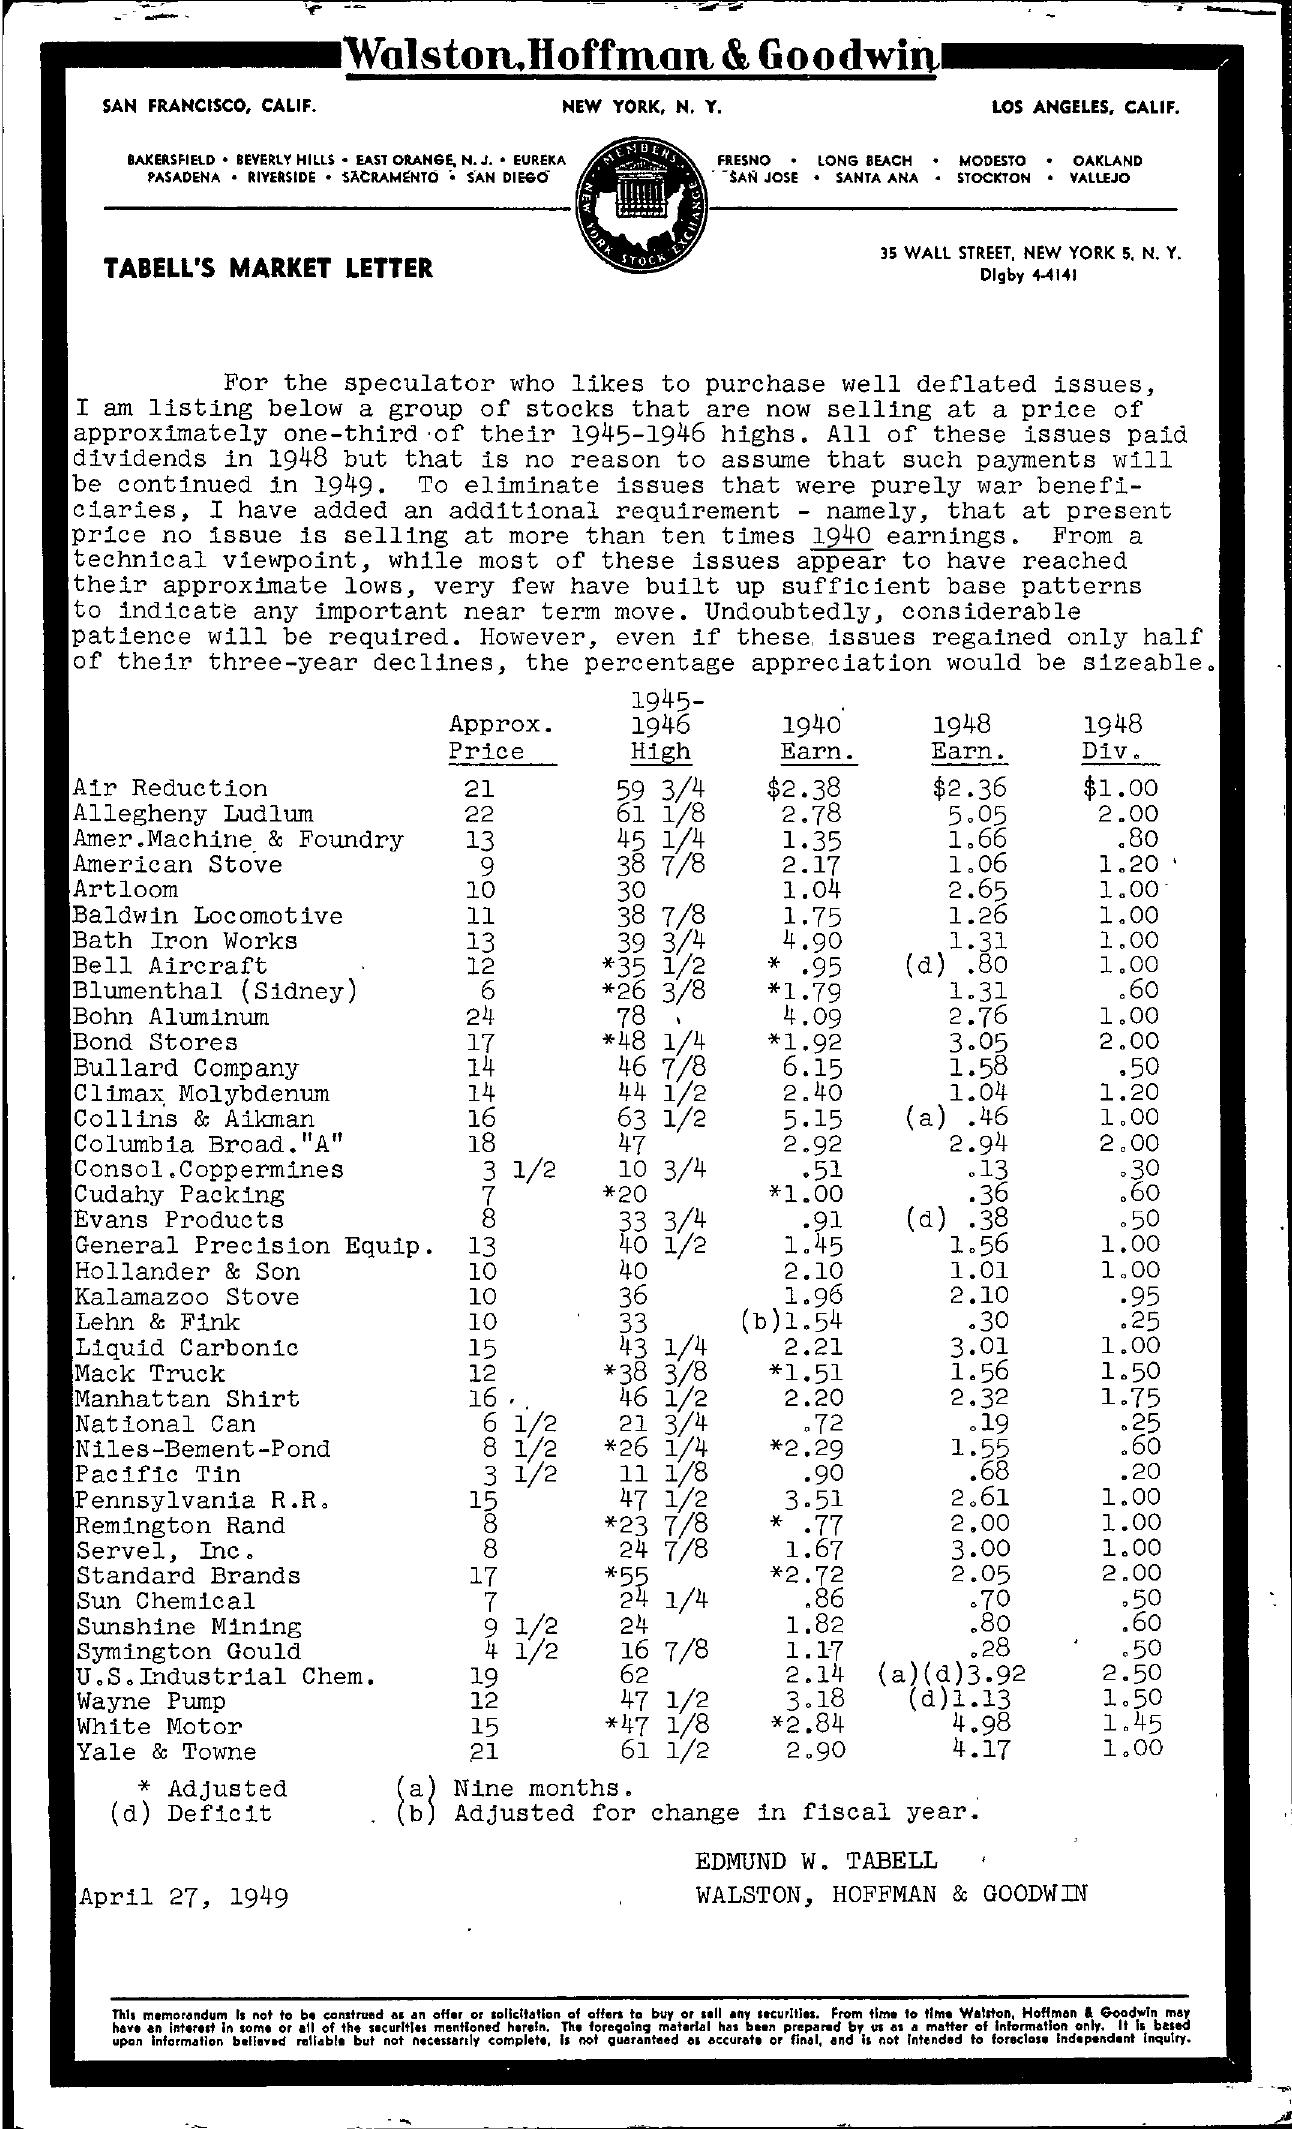 Tabell's Market Letter - April 27, 1949